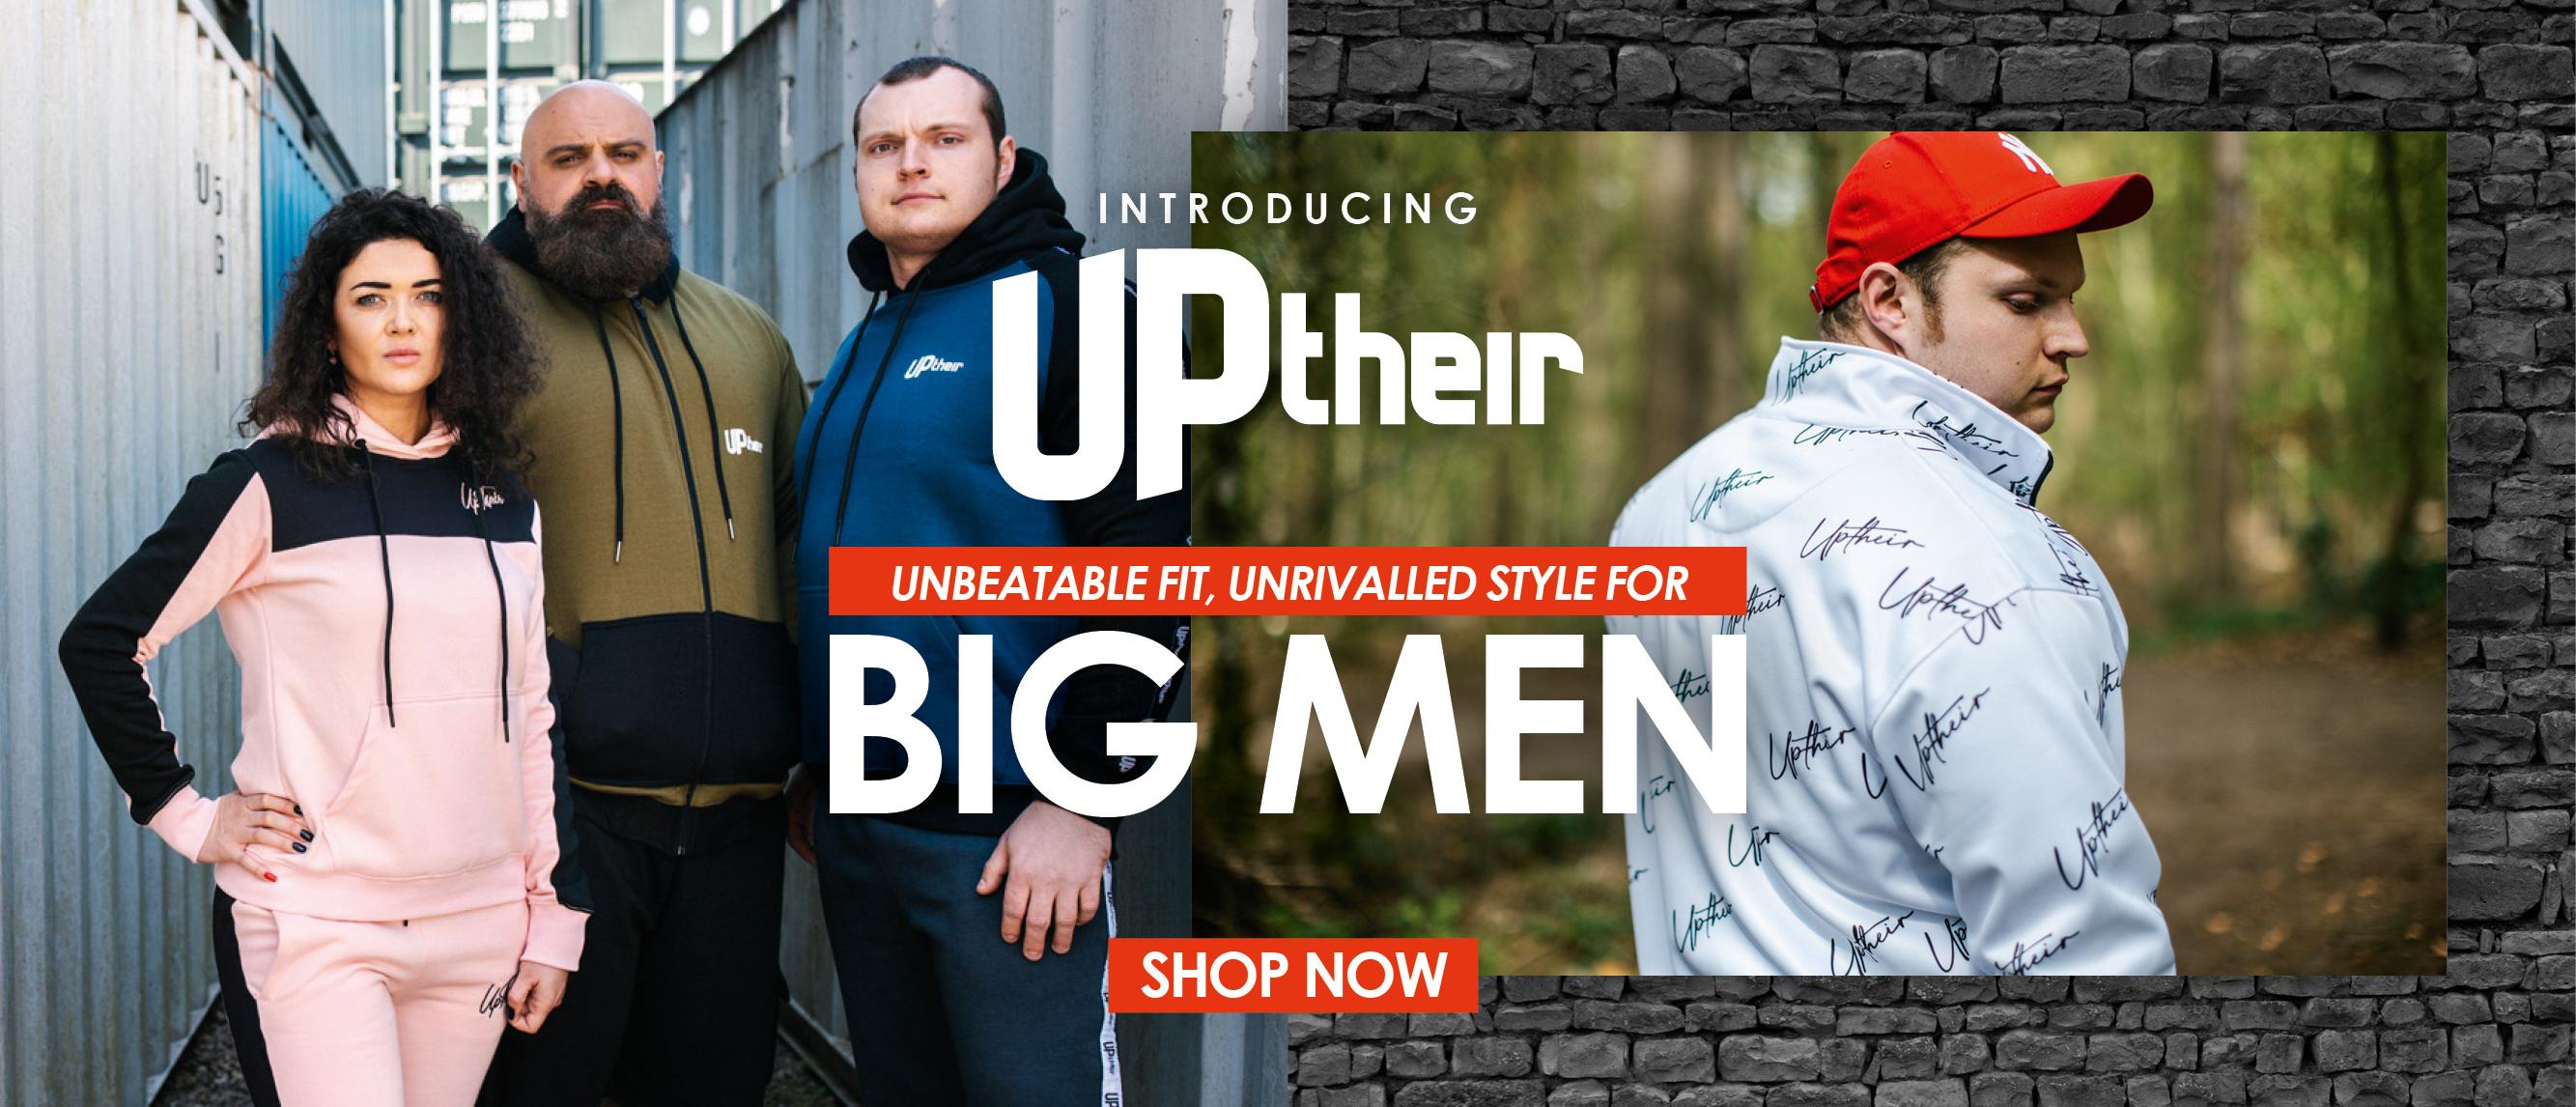 Shop Uptheir